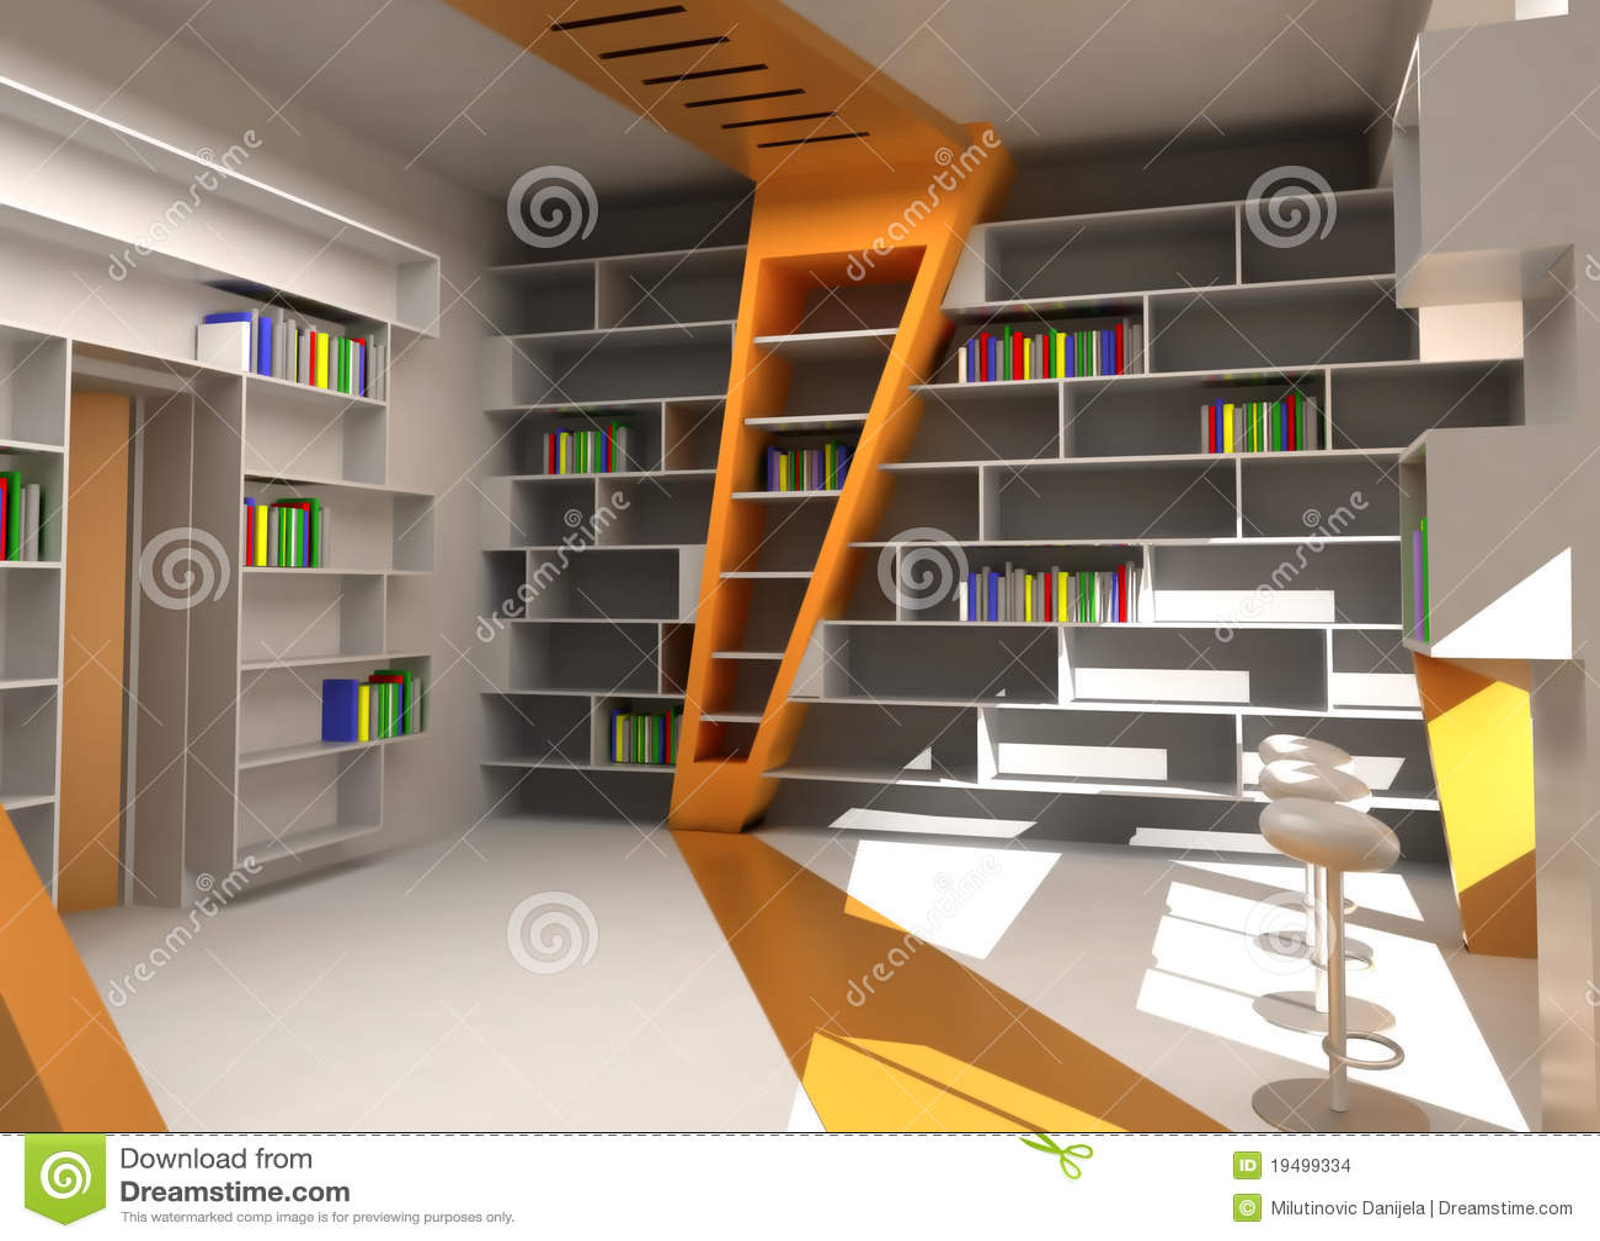 3D rendering stock illustration  Illustration of library - 19499334